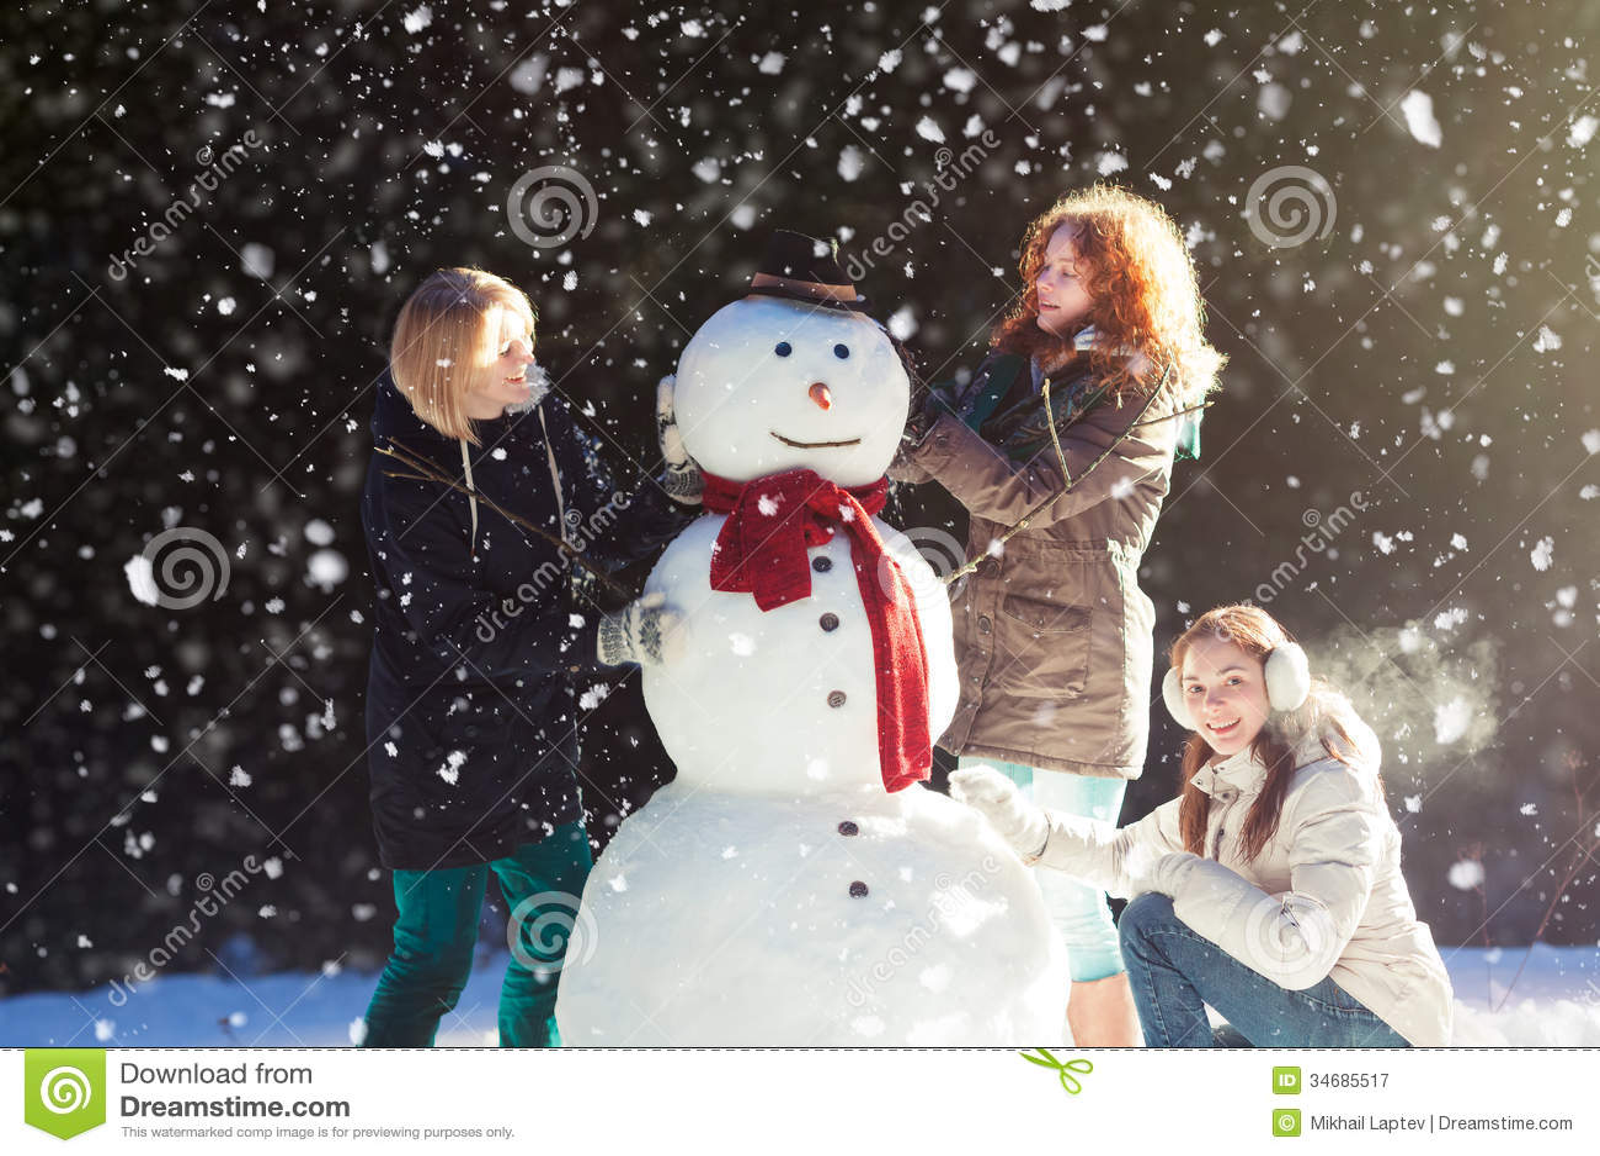 1177 best Winter Theme images on Pinterest | Winter theme ...